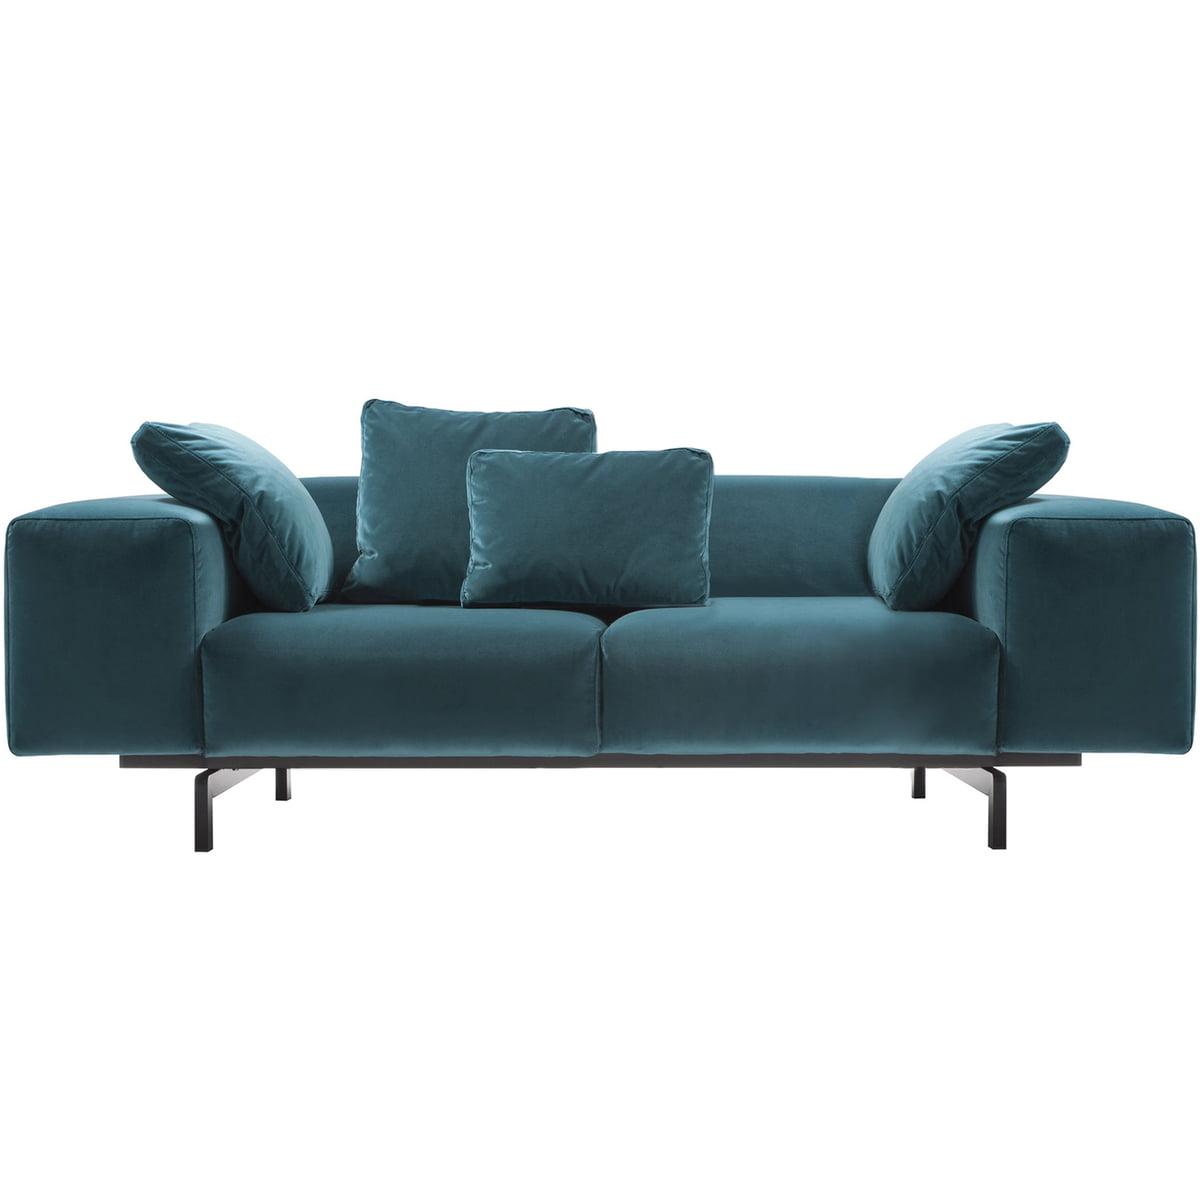 Kartell largo velluto 2 sitzer sofa blaugruen 53 frei